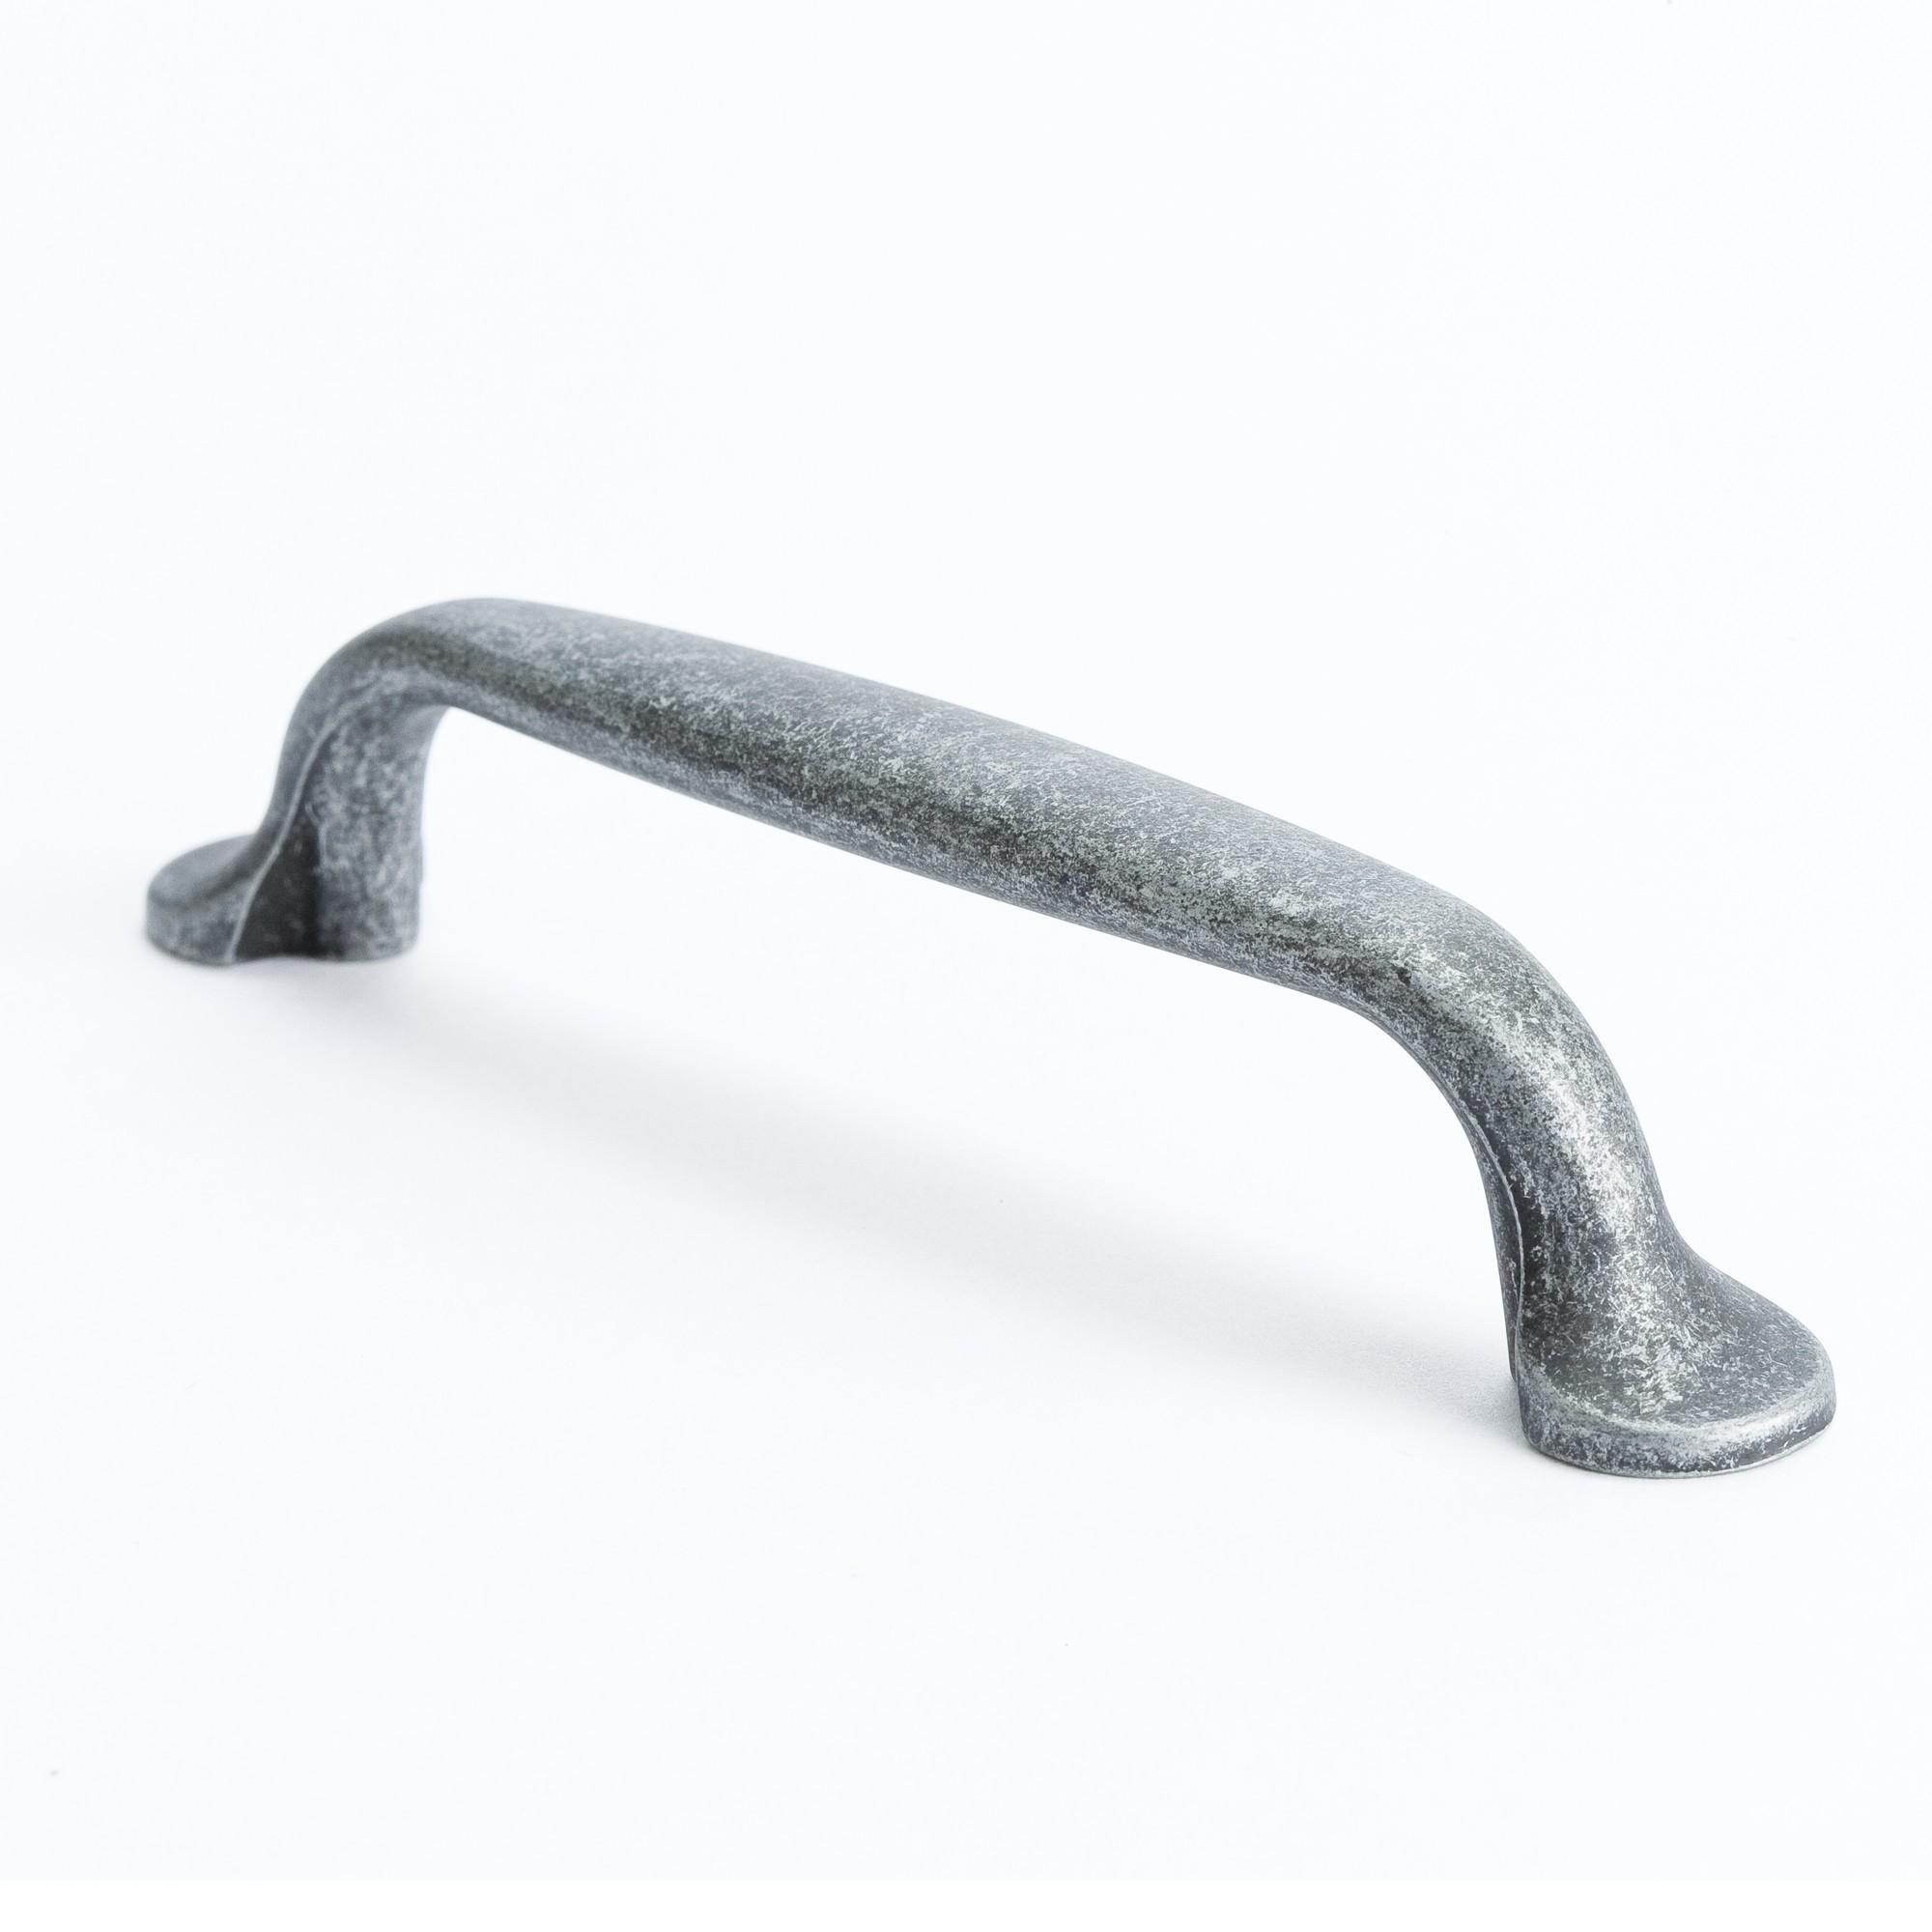 Pull (Rustic Iron) - 96mm